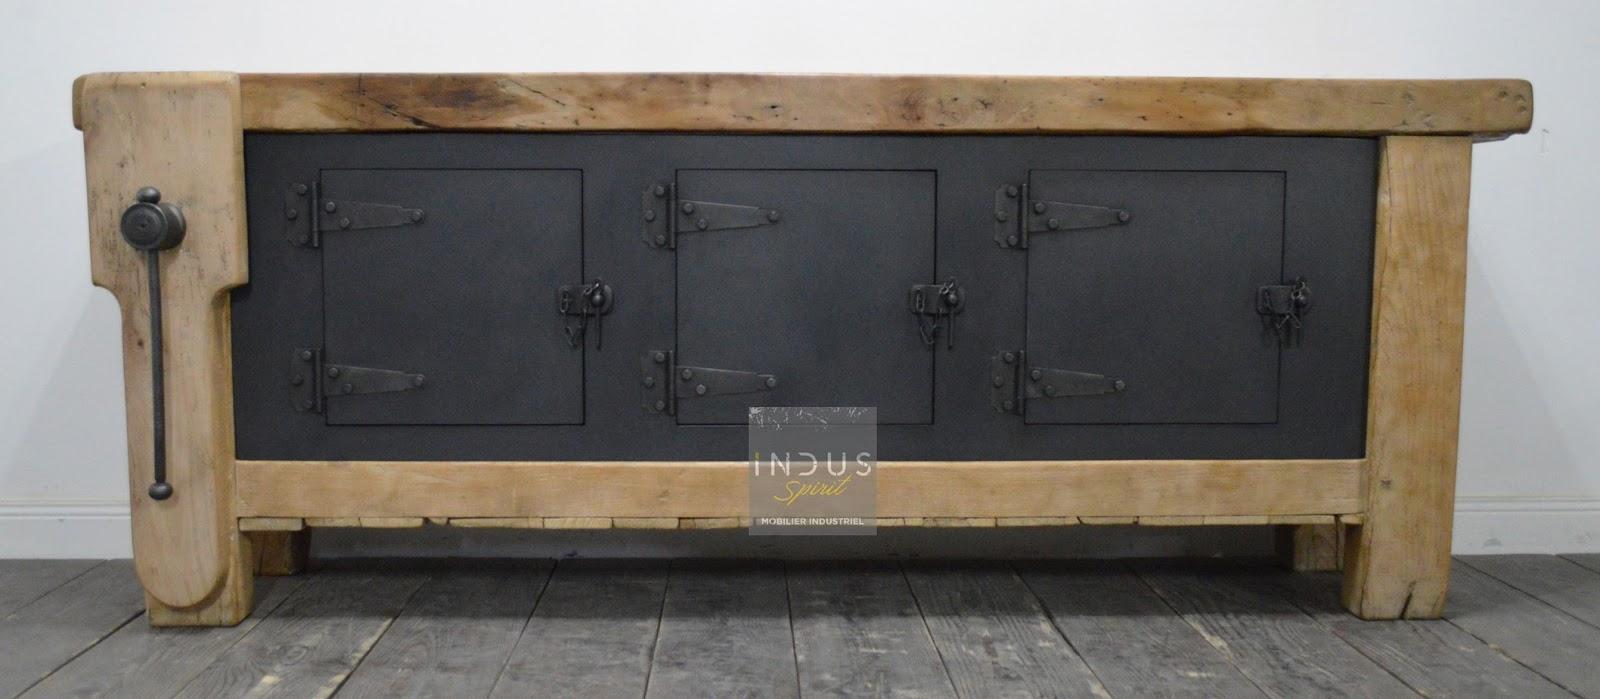 ancien tabli. Black Bedroom Furniture Sets. Home Design Ideas